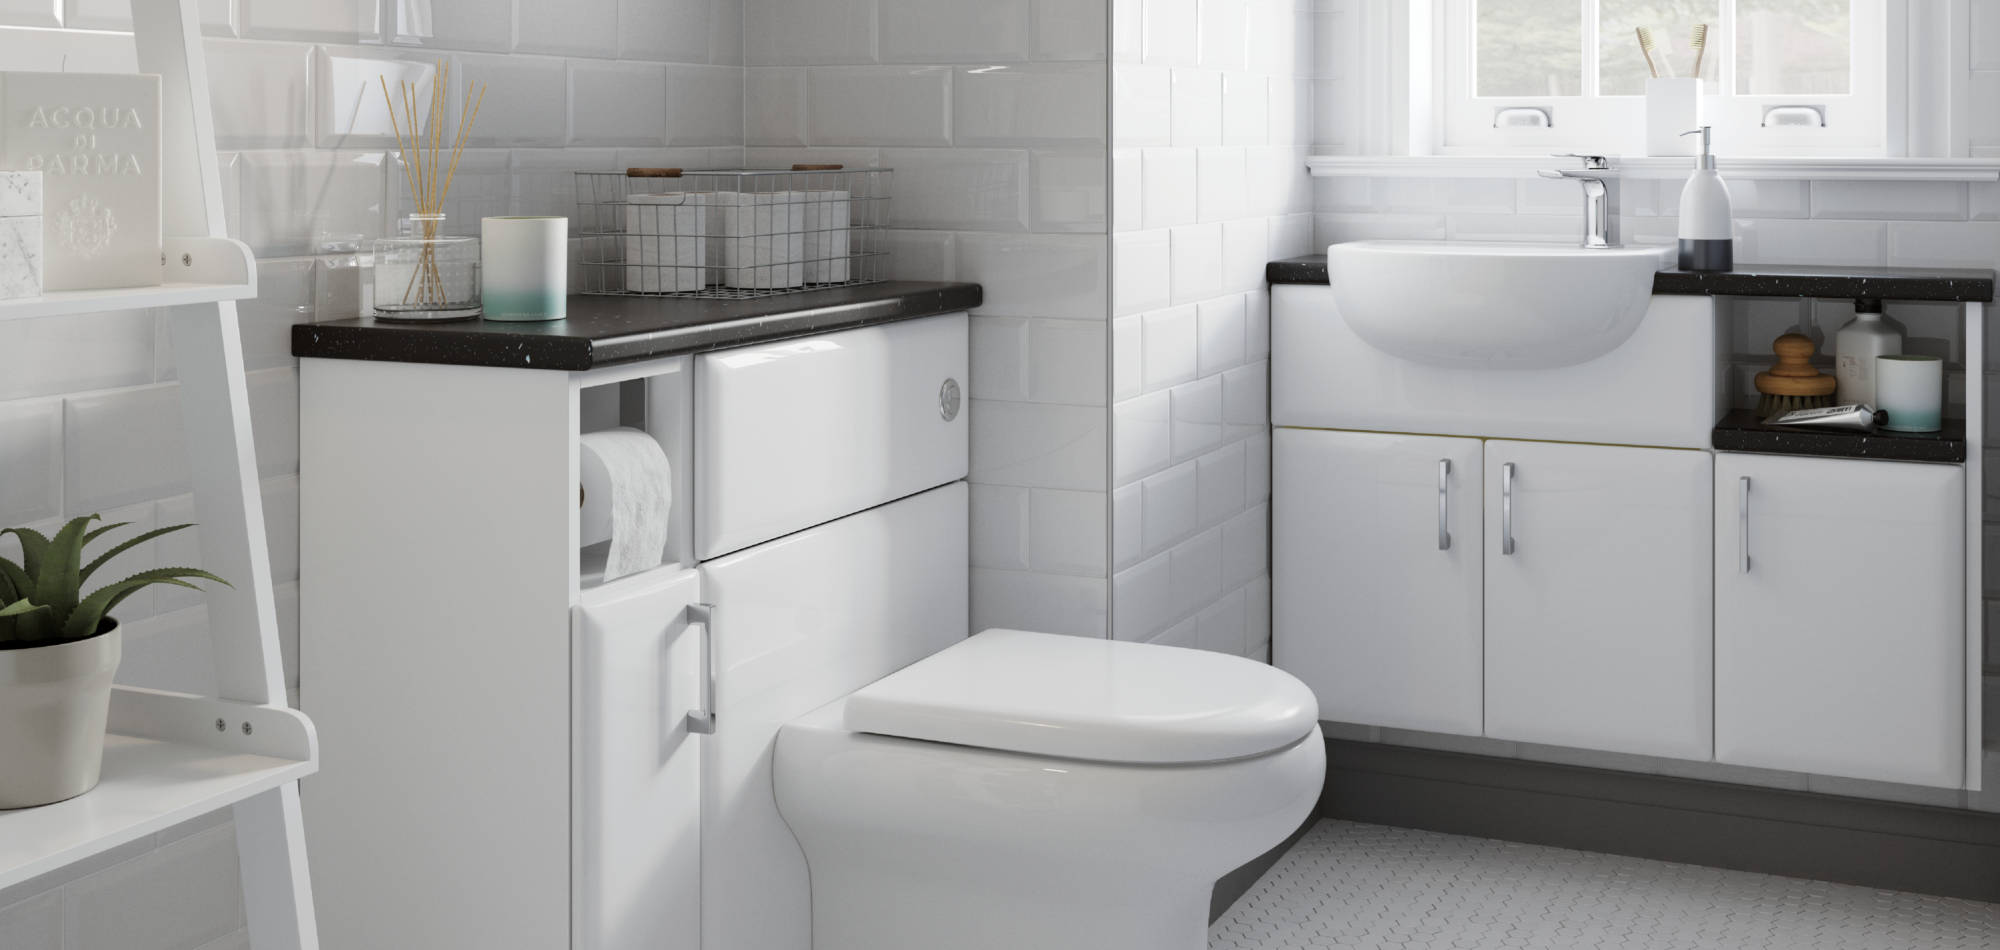 mereway bathrooms pacific white gloss